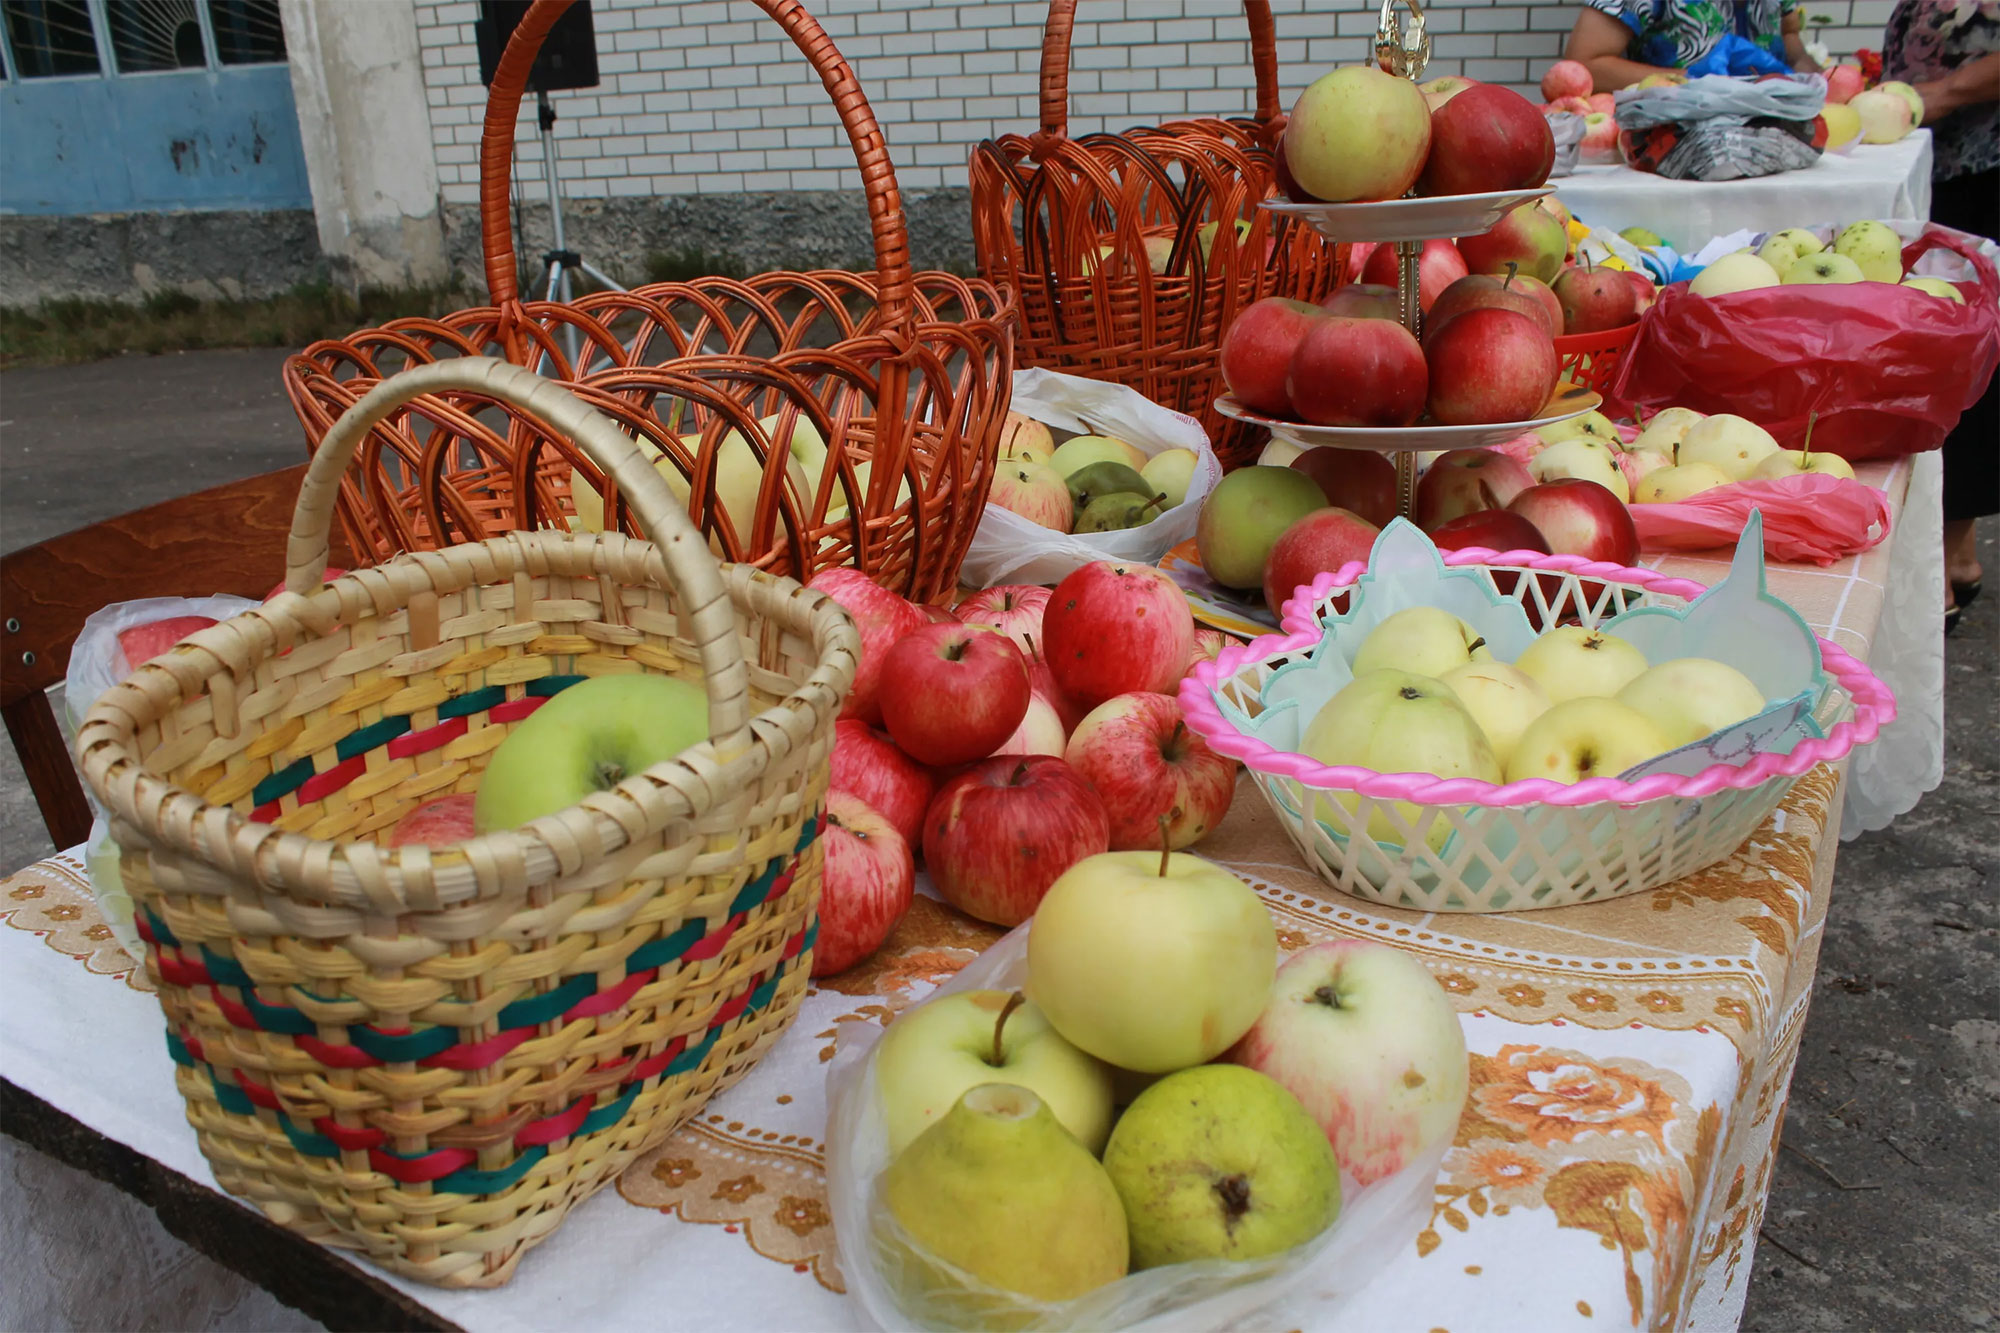 19 августа спас яблочный